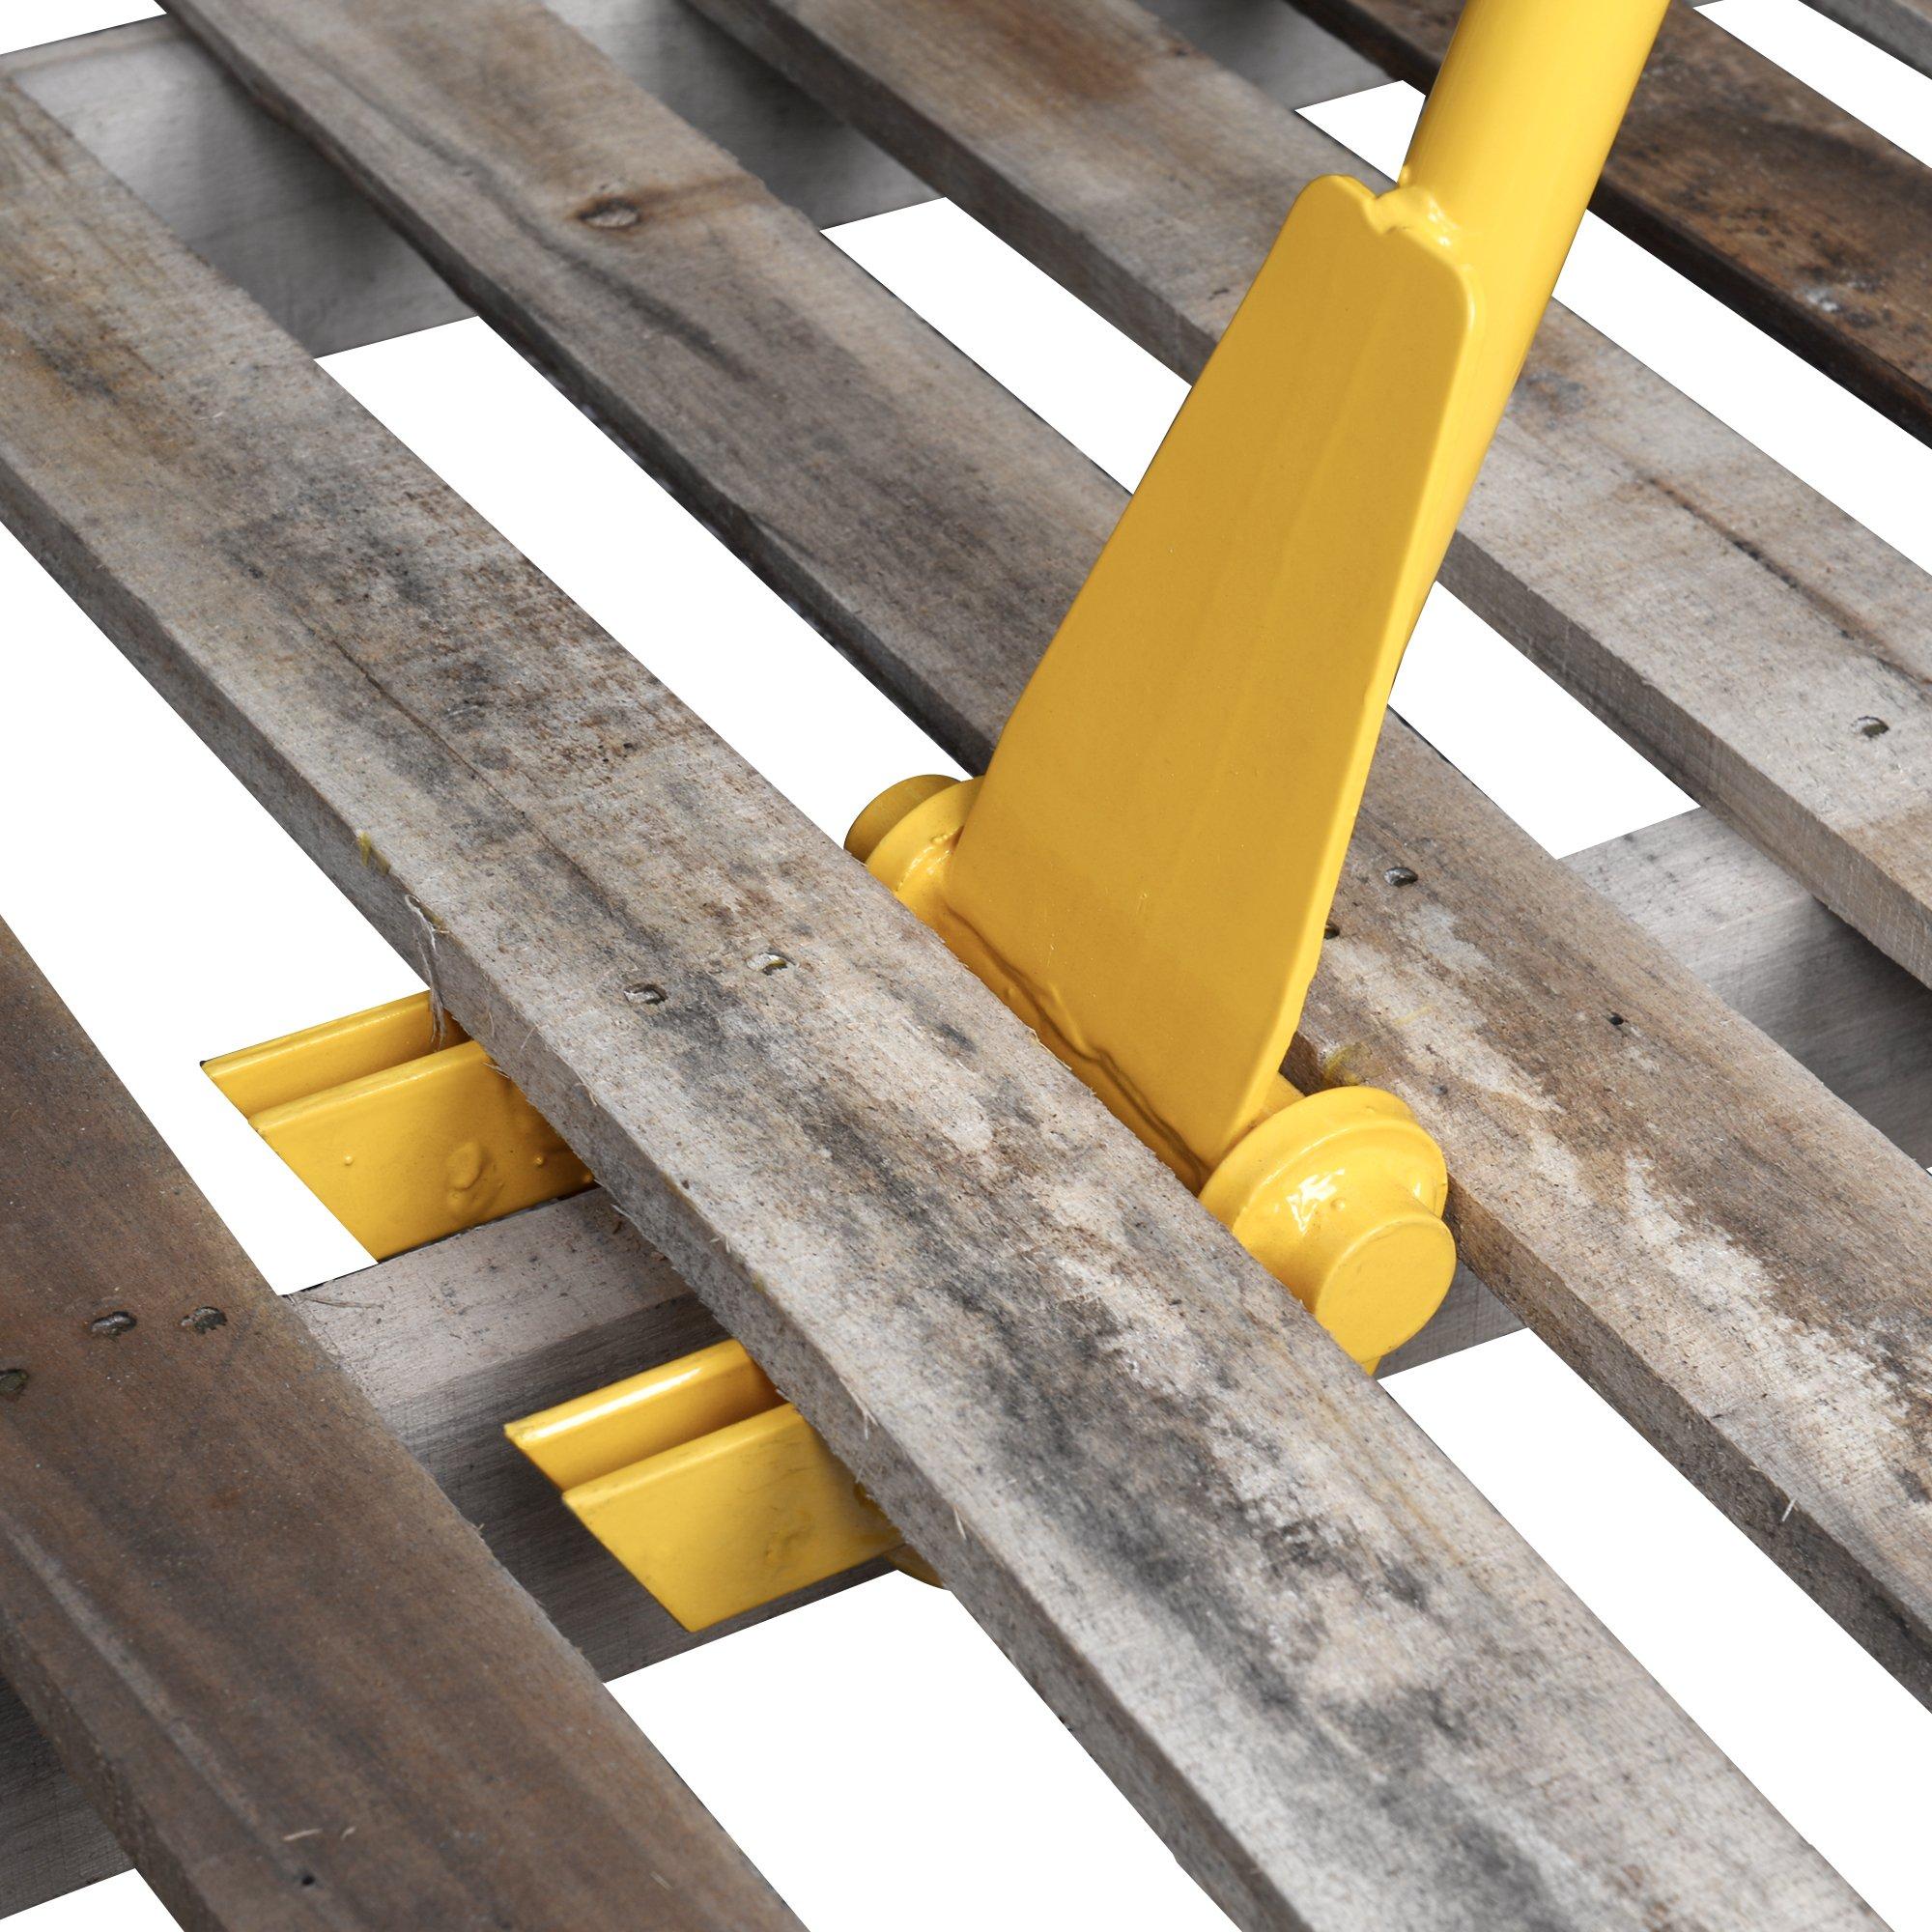 TIME SAVER - Pallet Buster Industrial Pry Bar For Easy Wood Pallet Destruction and Dismantler Premium Global Wood Breaker For Logistics Shippers Warehouses Anti Slip Grip Handles 41'' BL by 12Vmonster (Image #3)